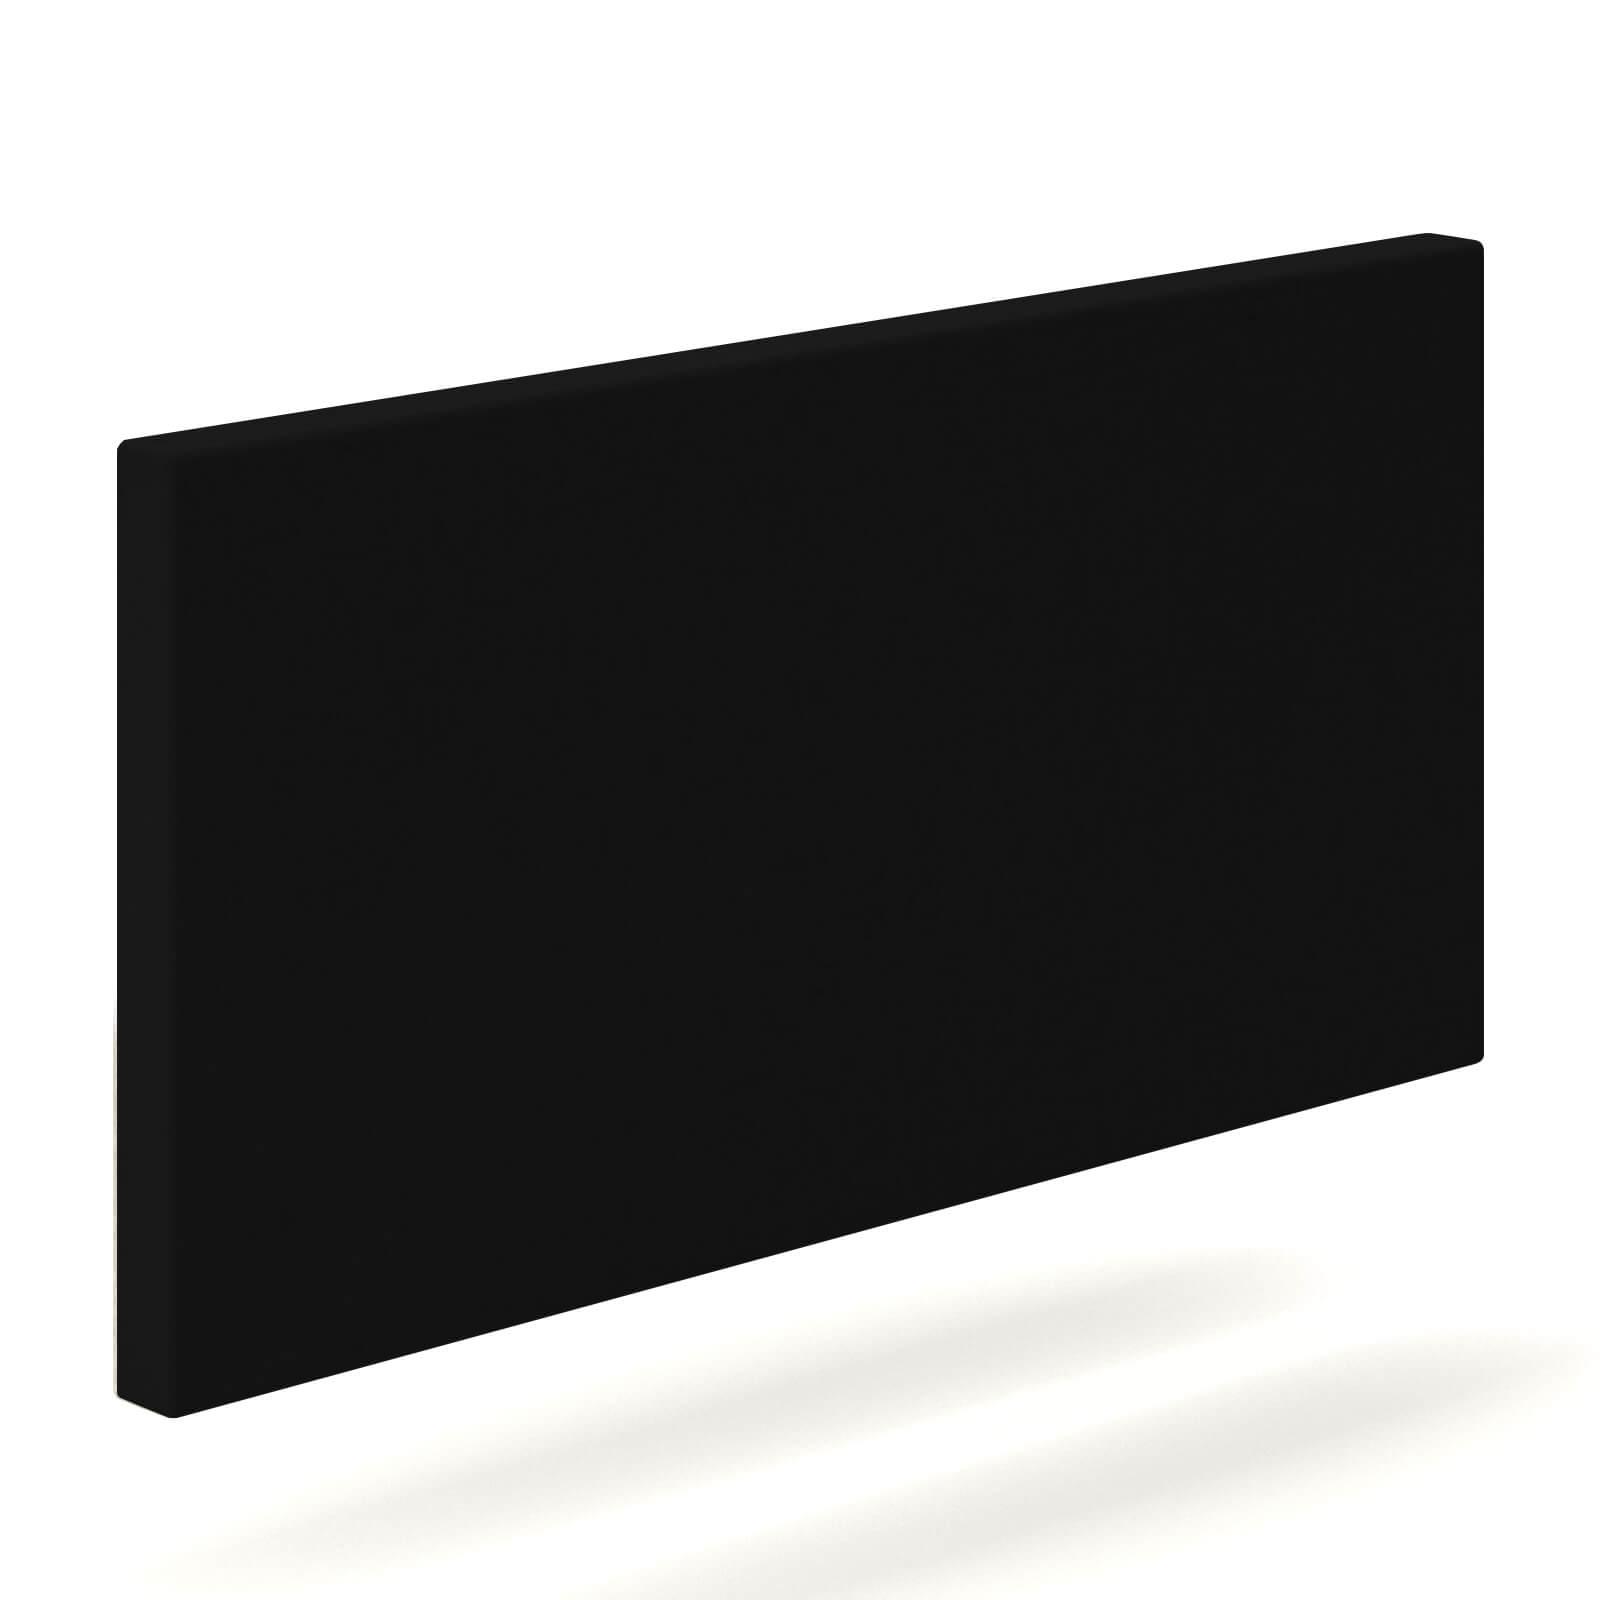 Akustik Deckensegel MODUS 800 x 400 mm horizontal Akustikplatten Paneel Filz